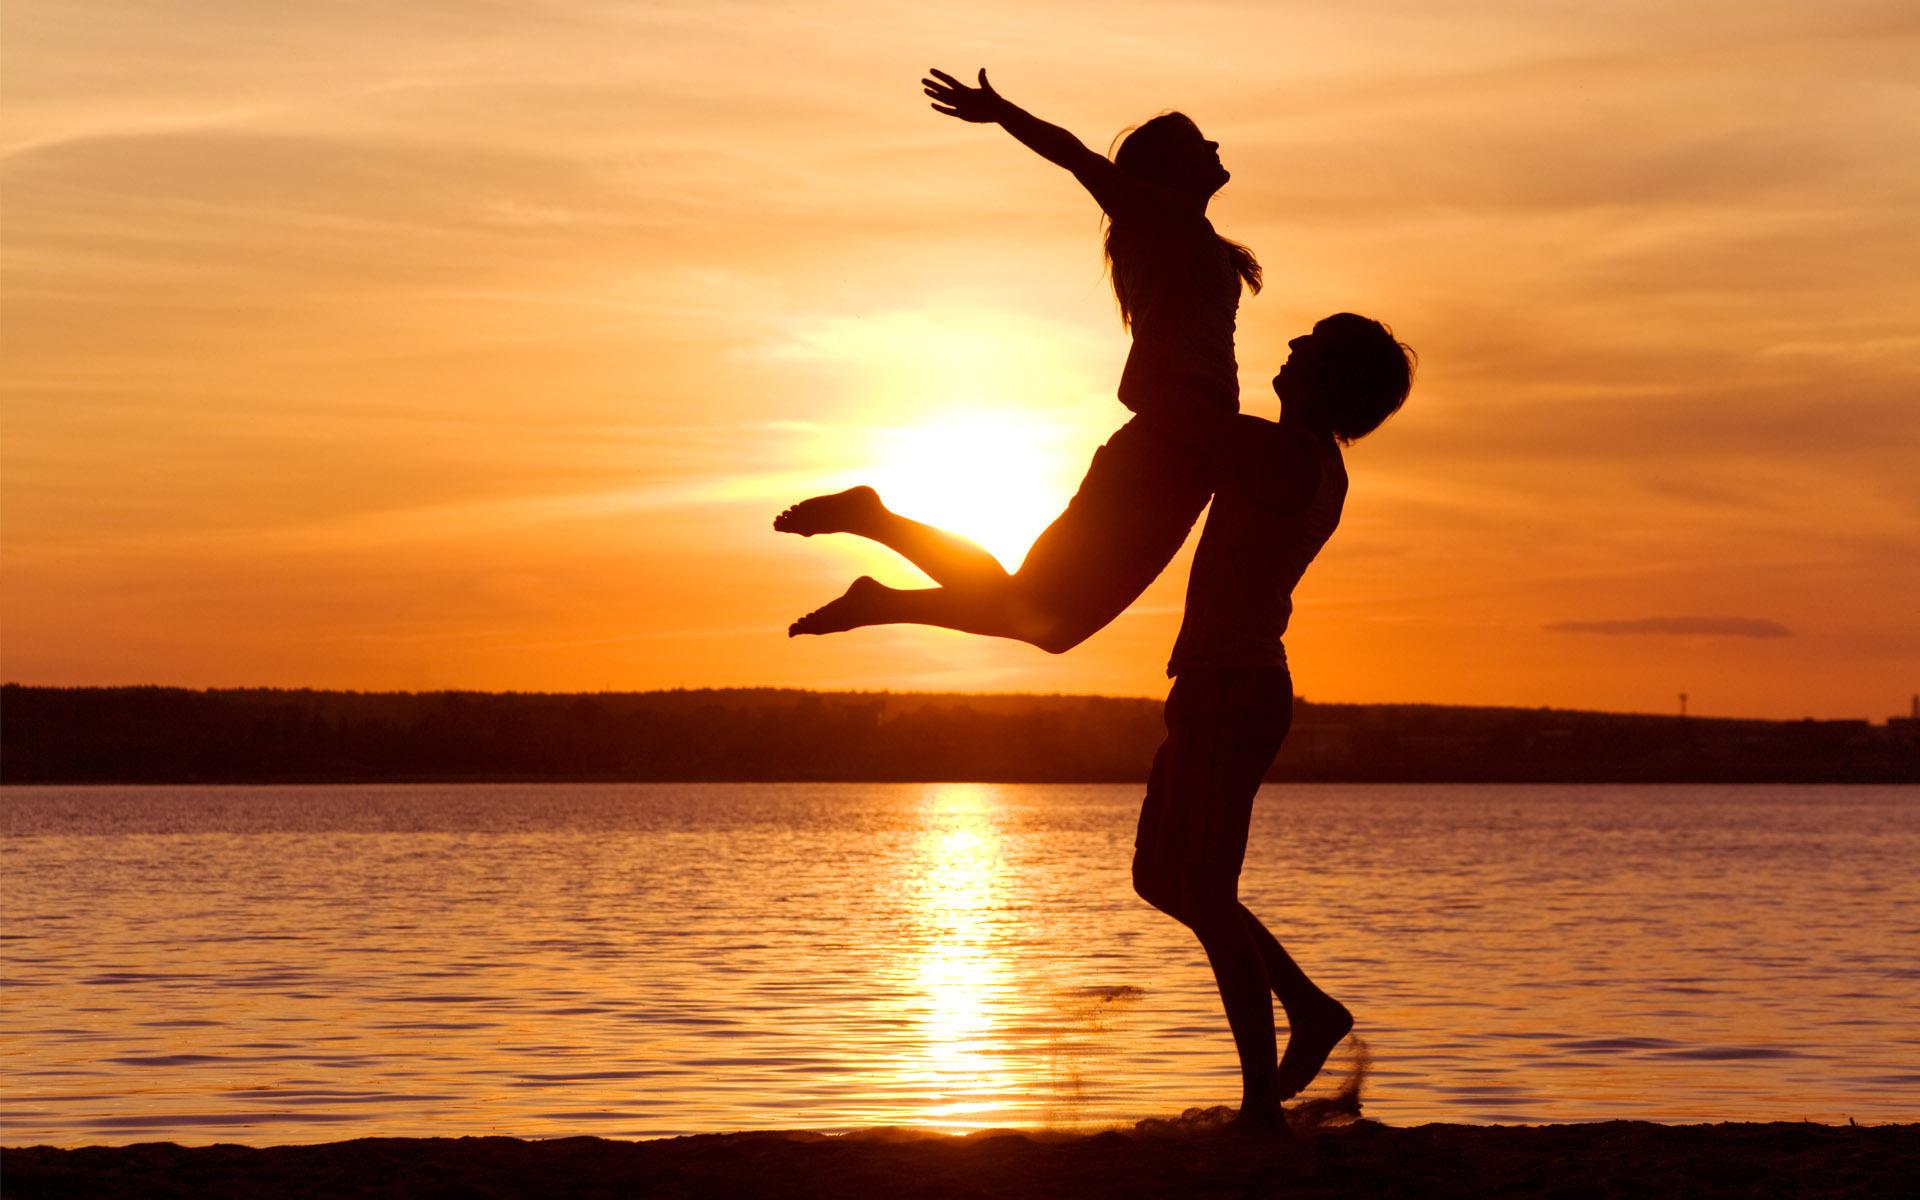 love-man-woman-silhouette-sun-sunset-sea-lake-beachother1_1